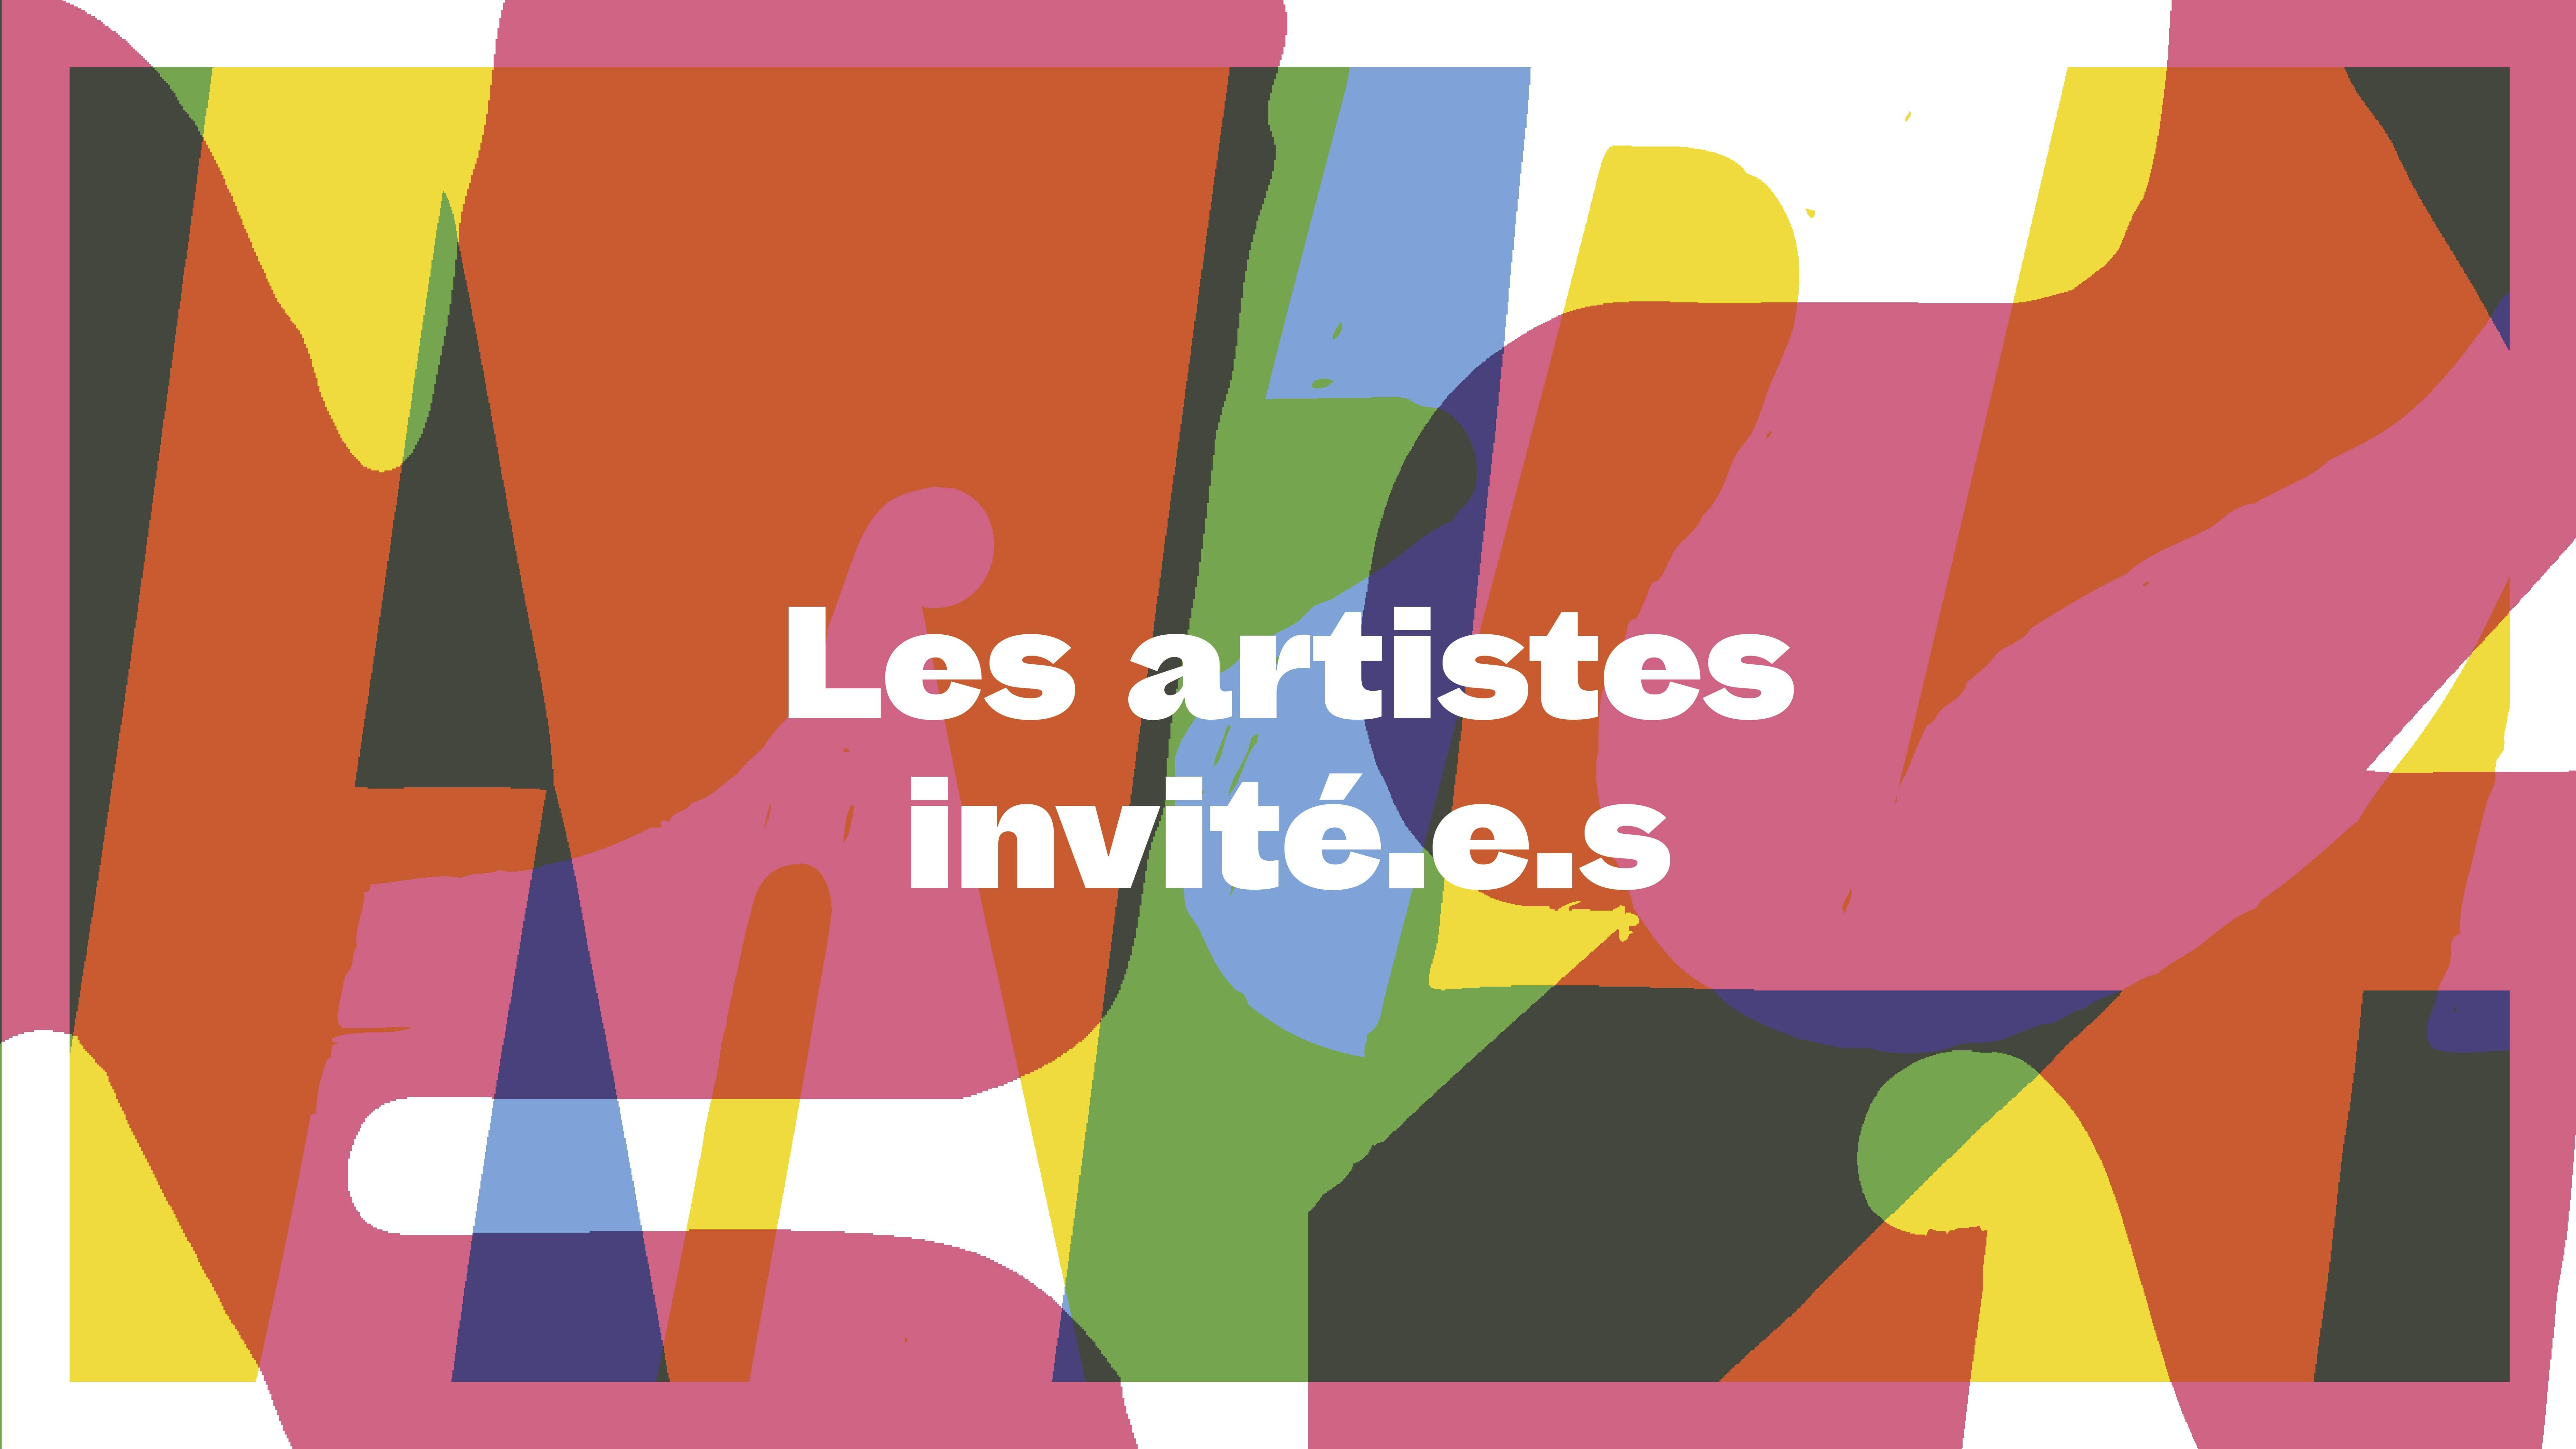 Les artistes invité.e.s